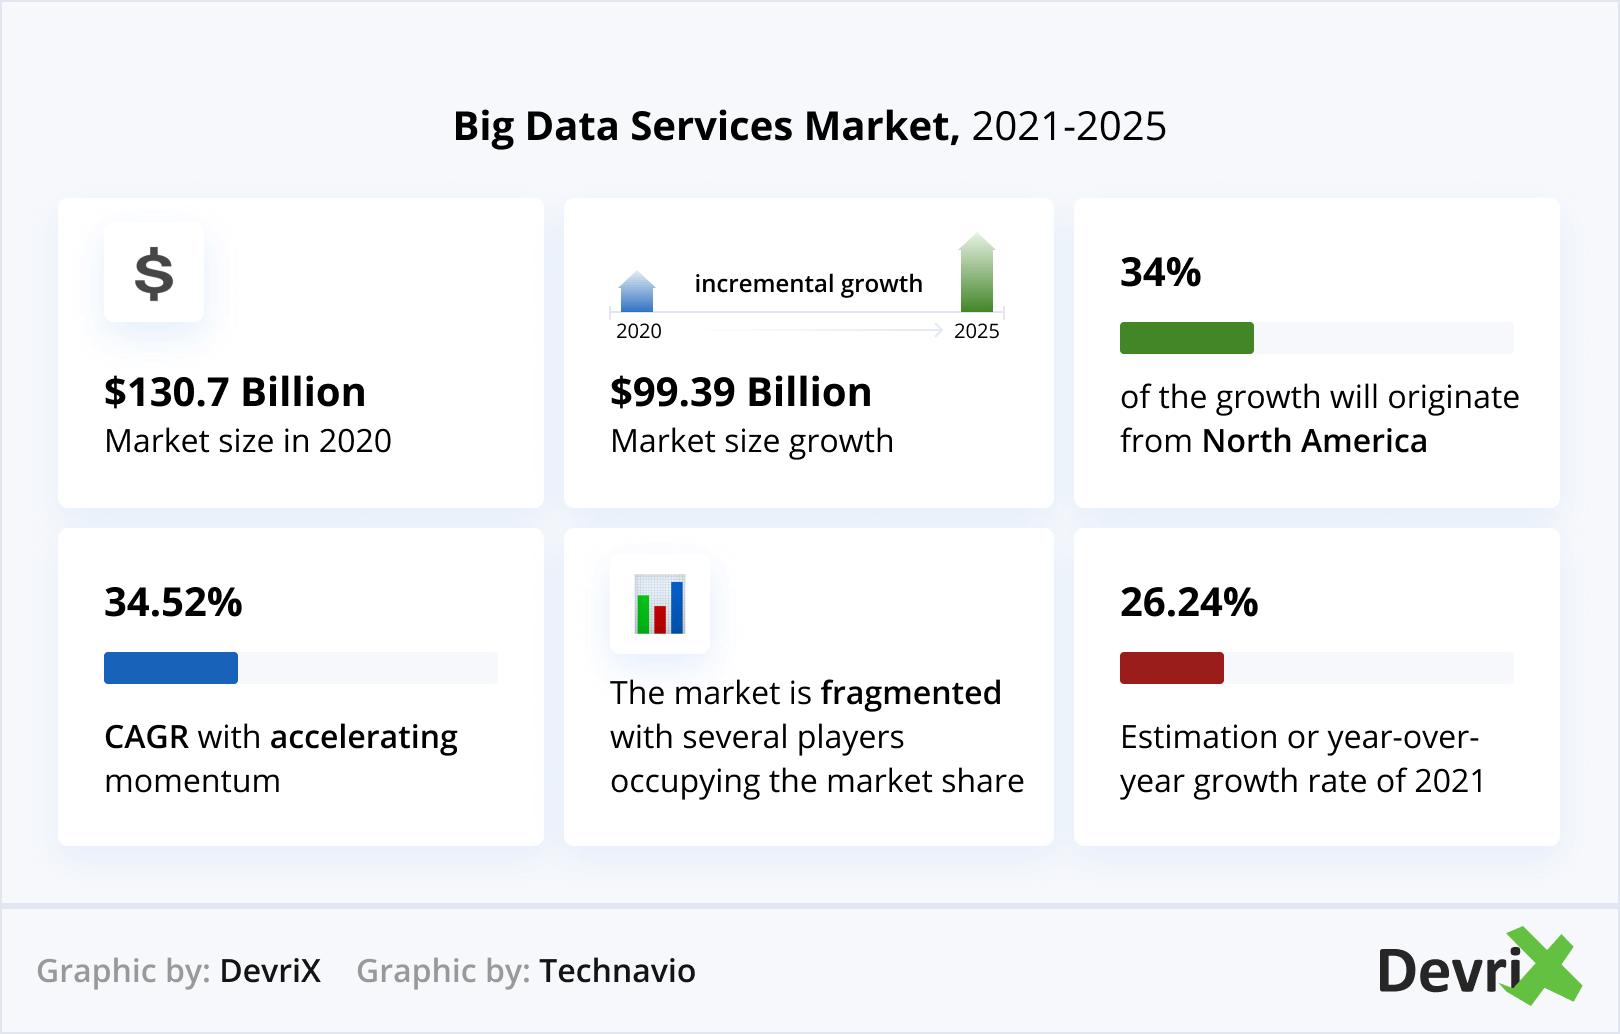 Big Data Services Market 2021-2025